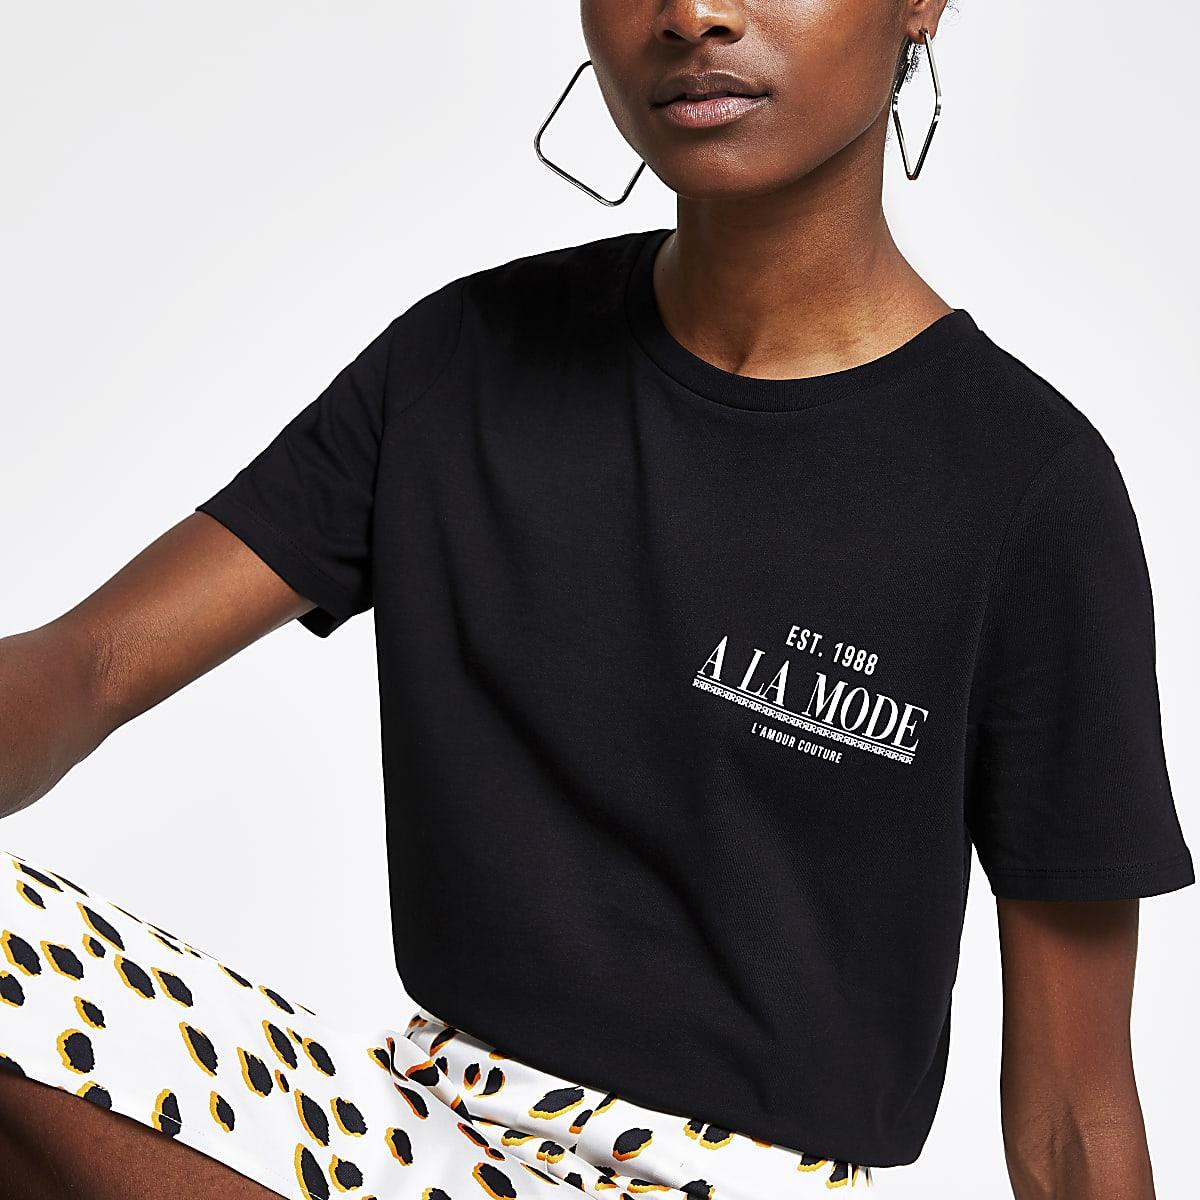 Black 'A La Mode' fitted T-shirt